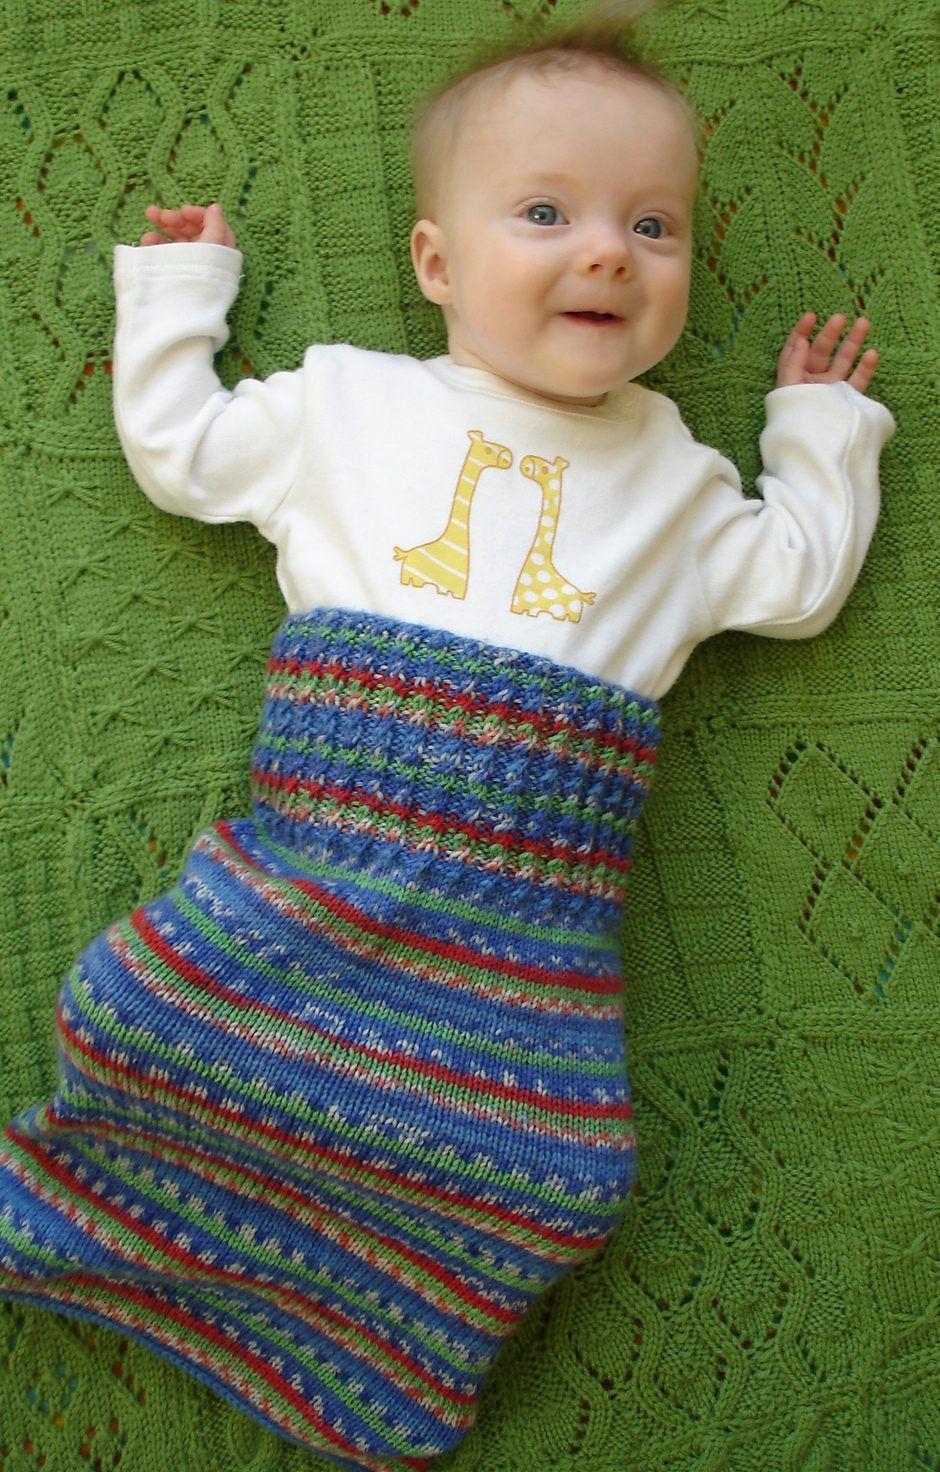 Free knitting pattern for baby kicking bag annikas design is free knitting pattern for baby kicking bag annikas design is great way to use up bankloansurffo Gallery